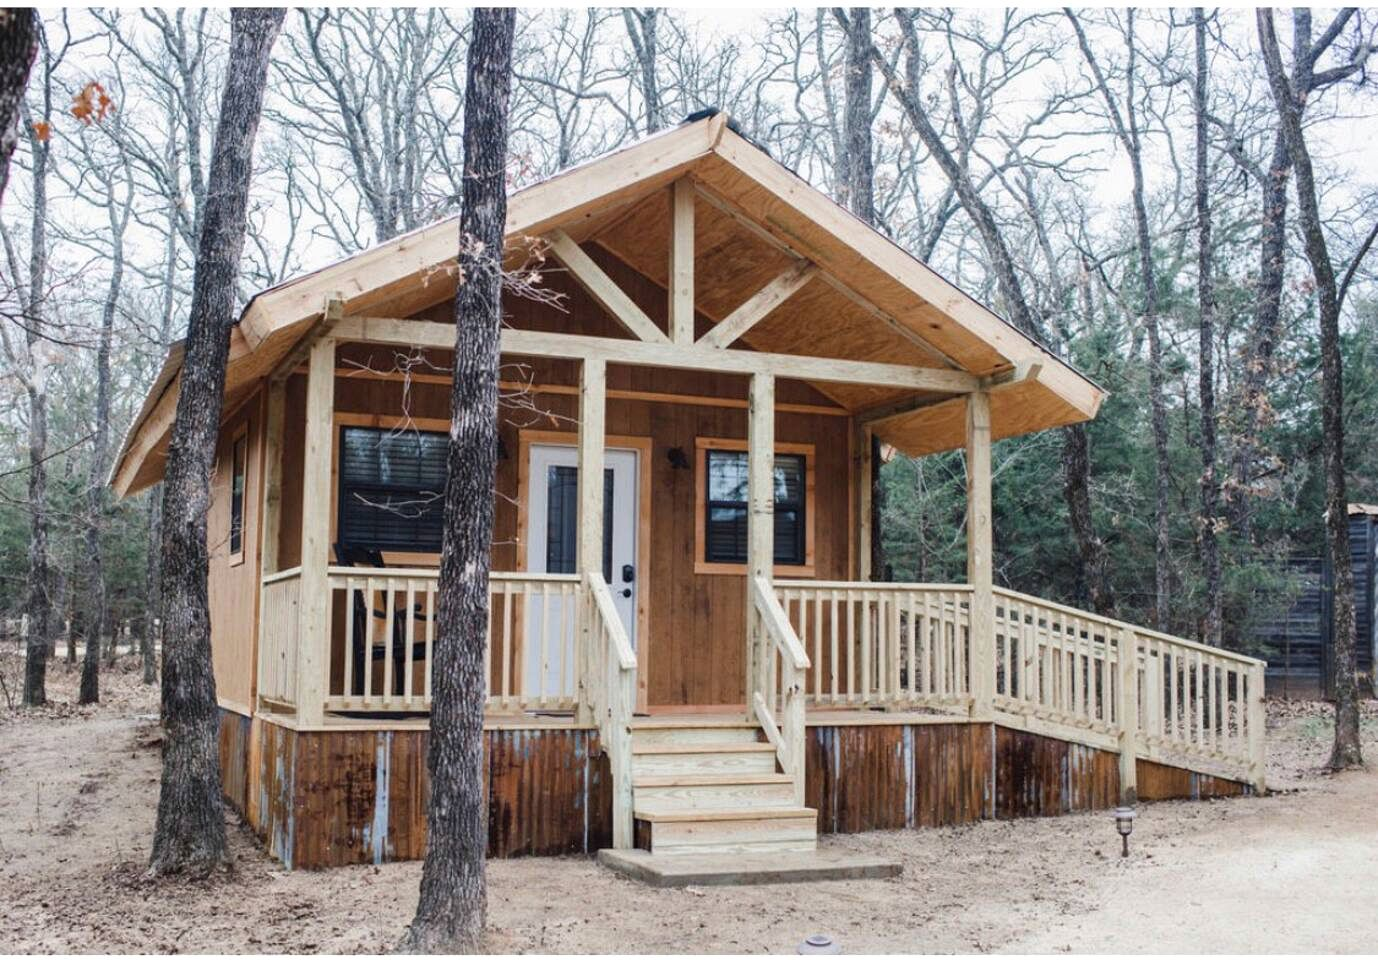 Texas Cabin Rental   Romantic Getaway from Dallas ...